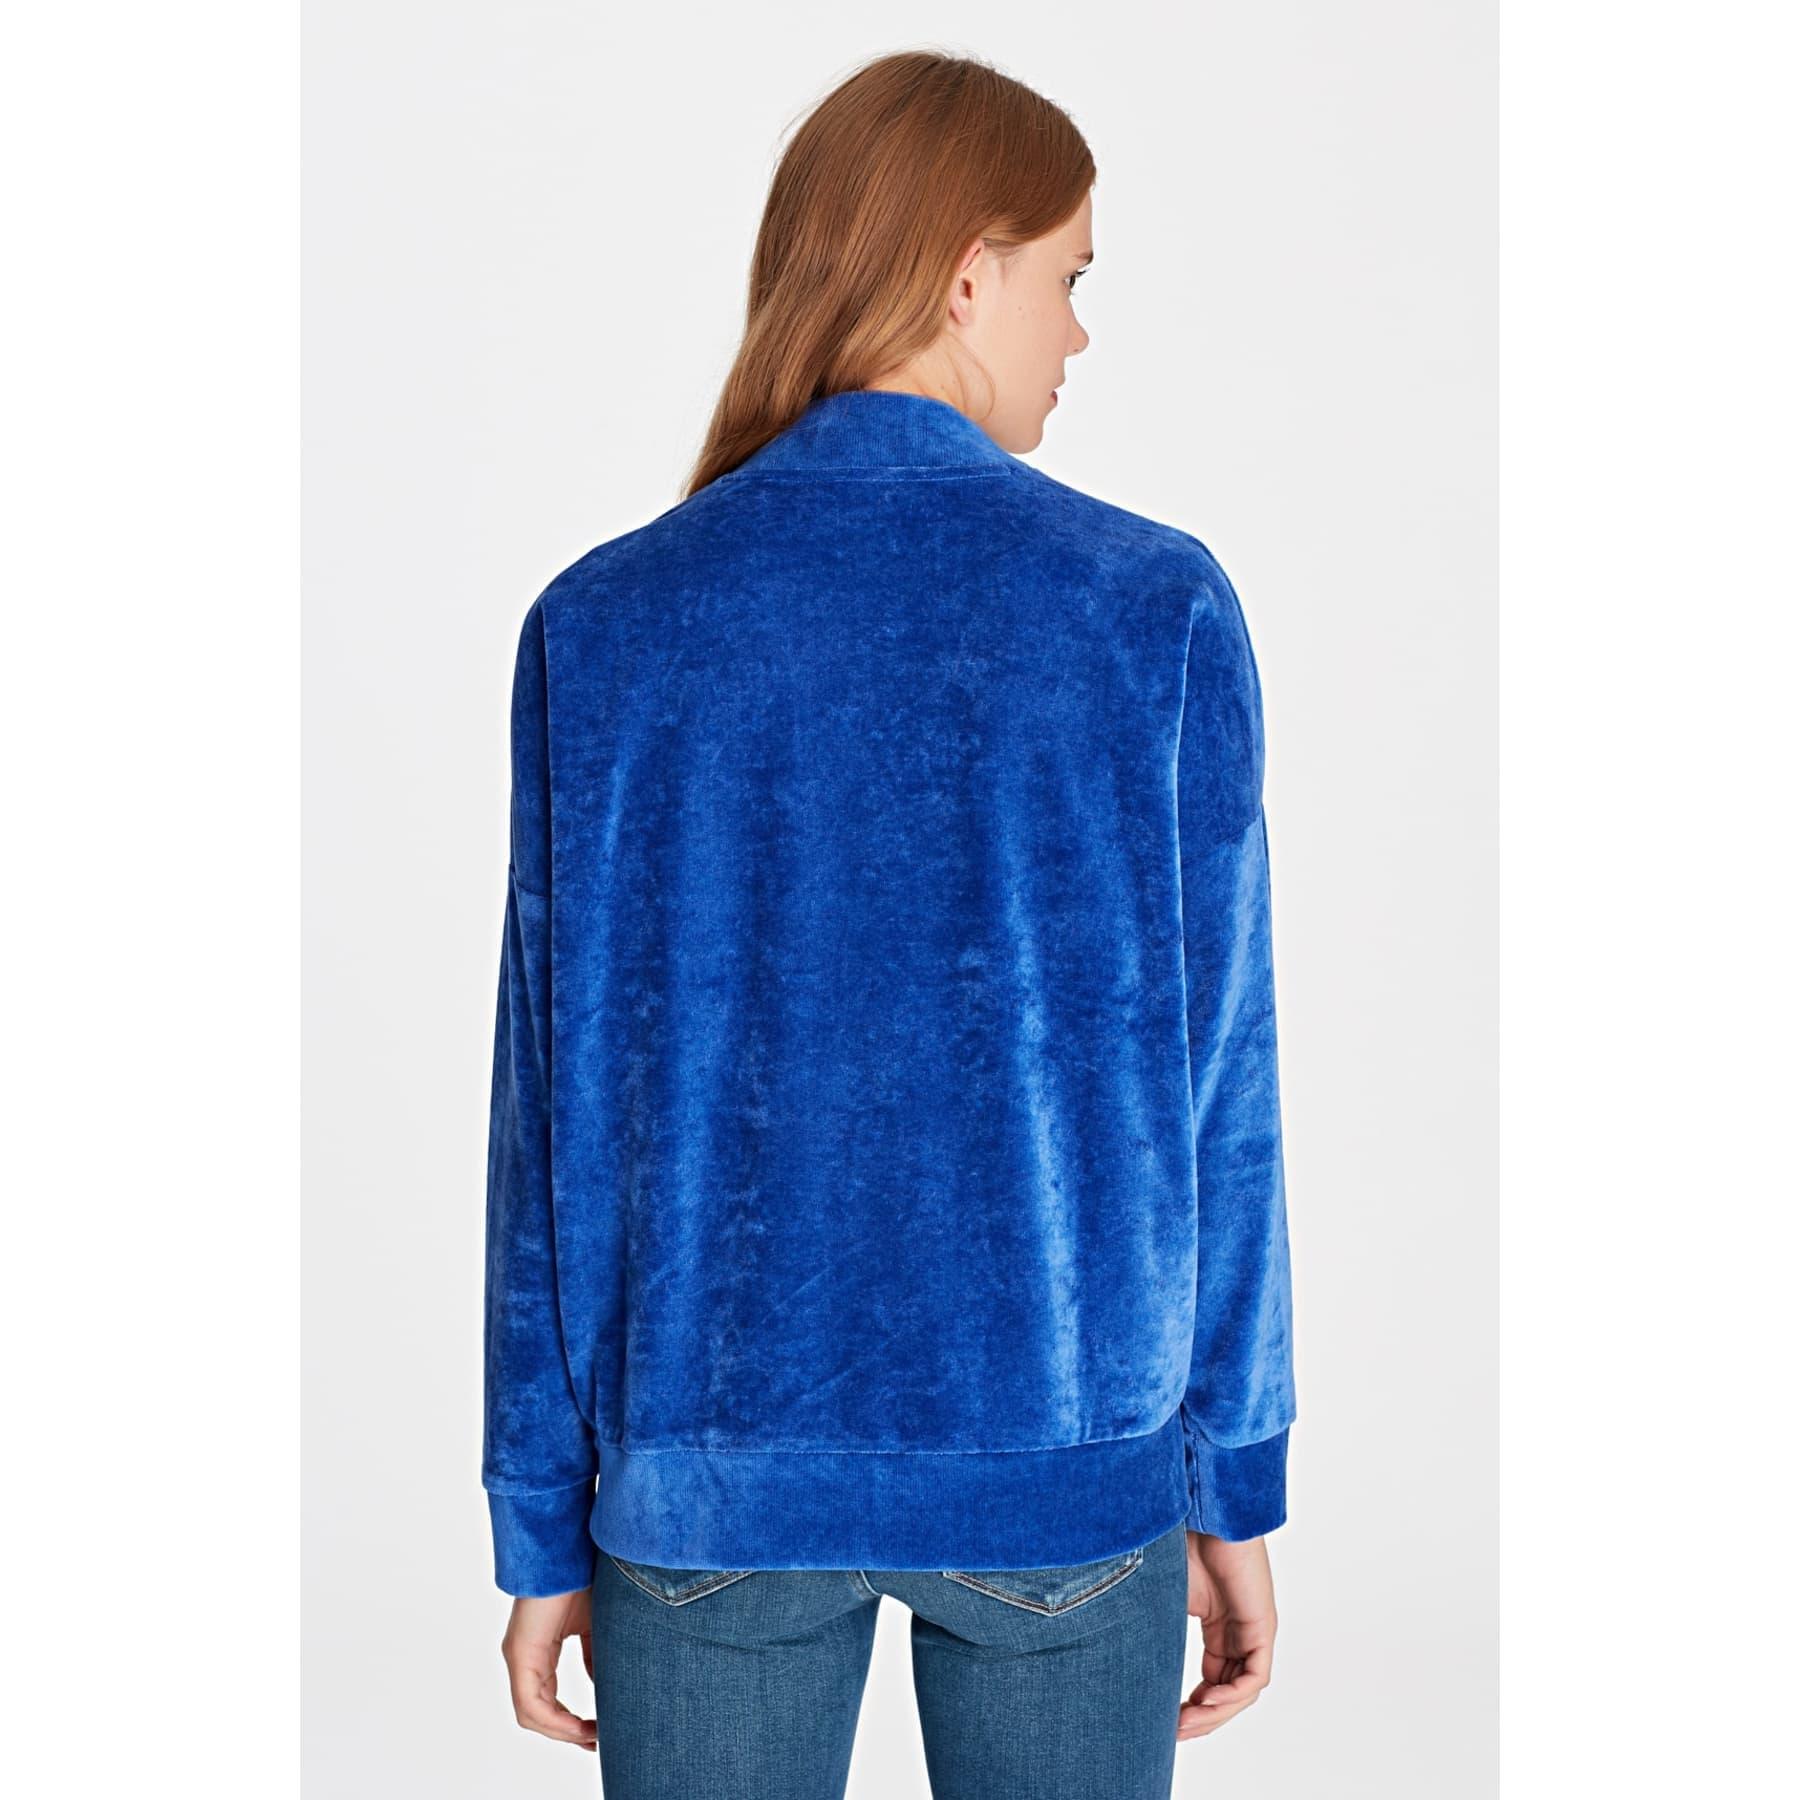 Mavi Jeans Kadife Kadın Lacivert Sweatshirt